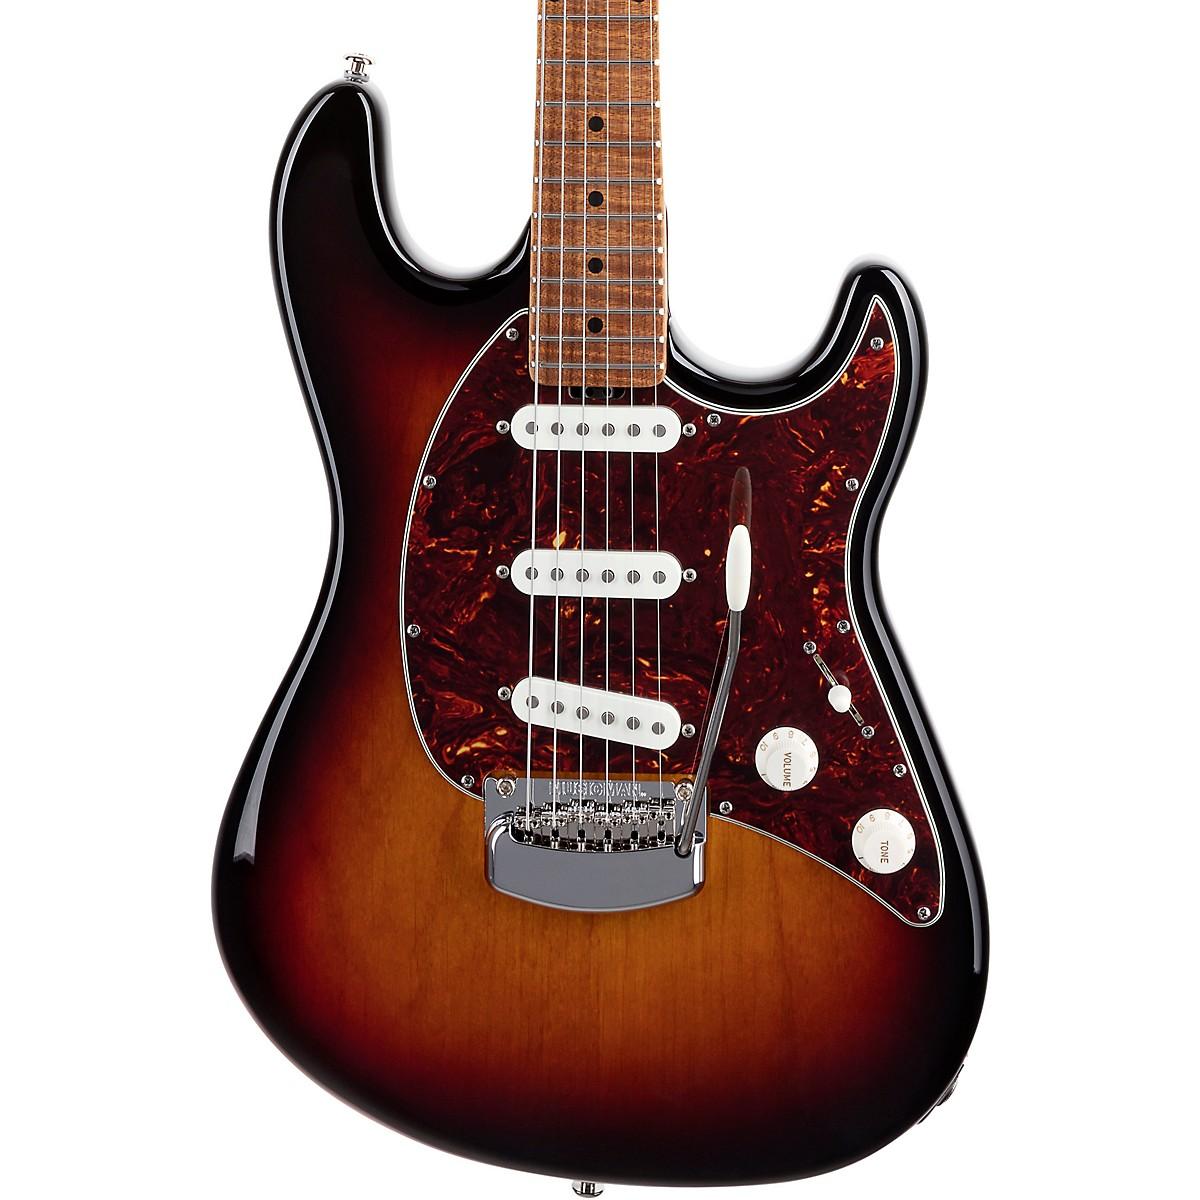 Ernie Ball Music Man Cutlass RS SSS Maple Fingerboard Electric Guitar